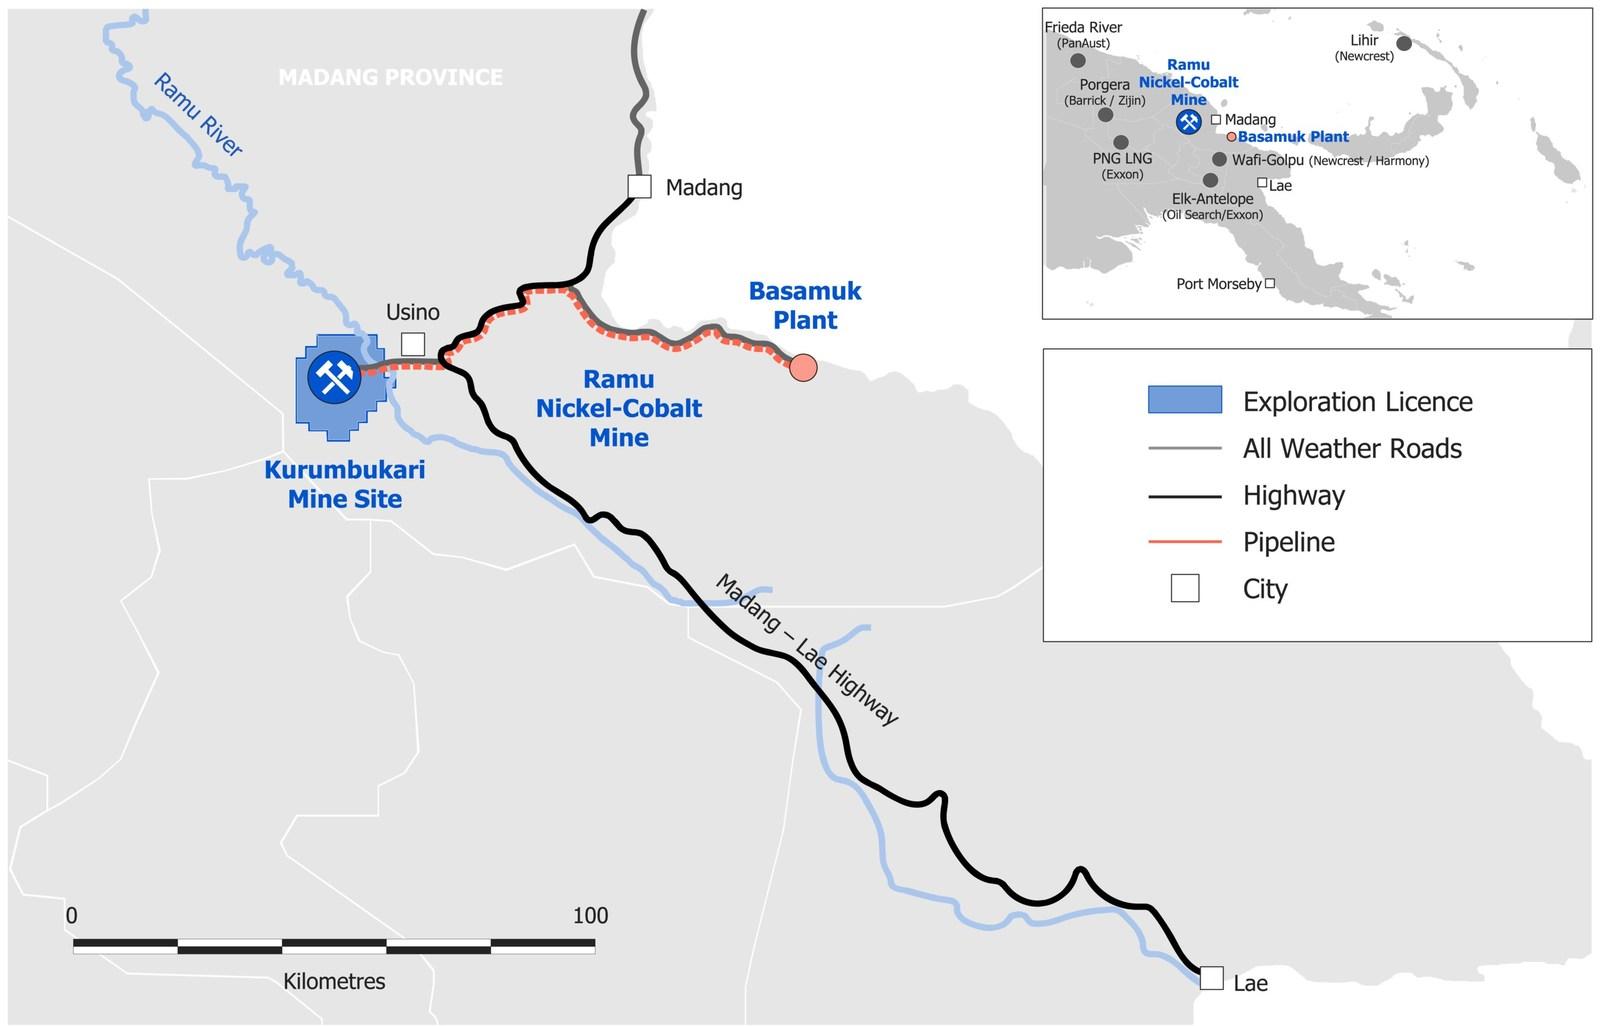 Figure 1 - Ramu Location and Surrounding Infrastructure